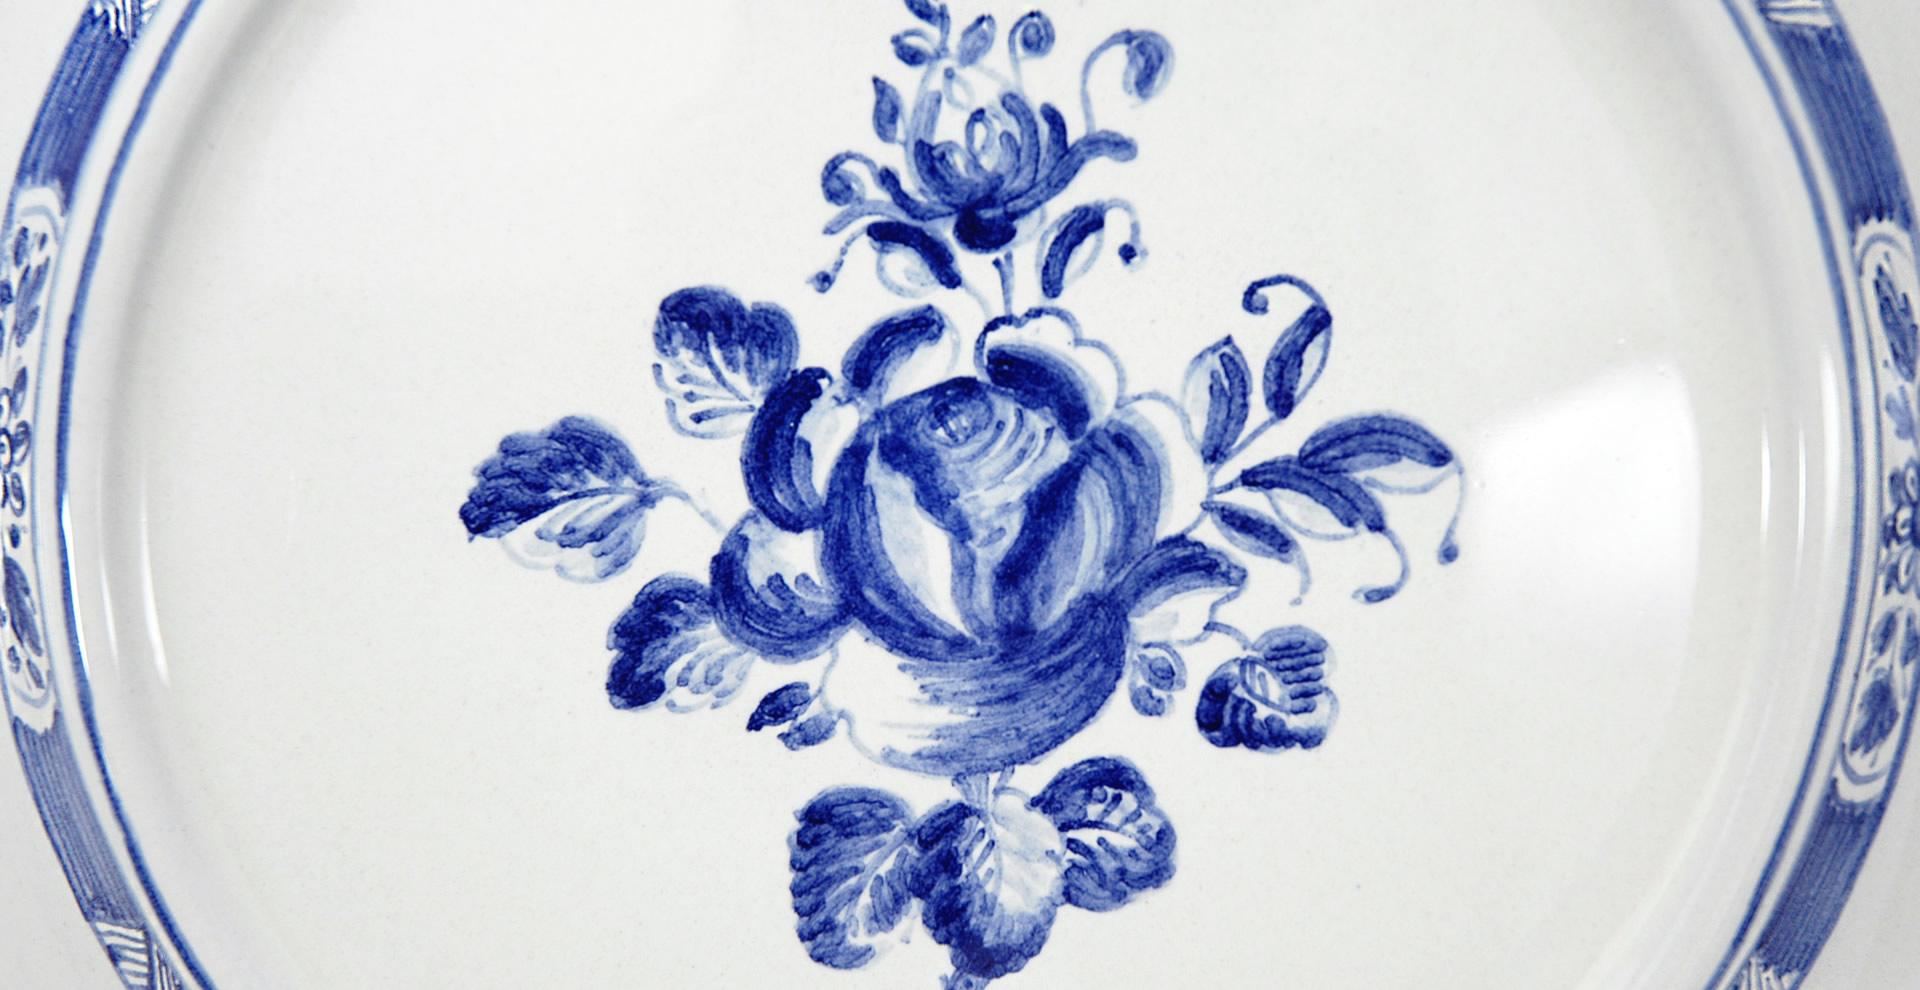 rosa-blu-slider-zuppiera-liscia-12-persone-6